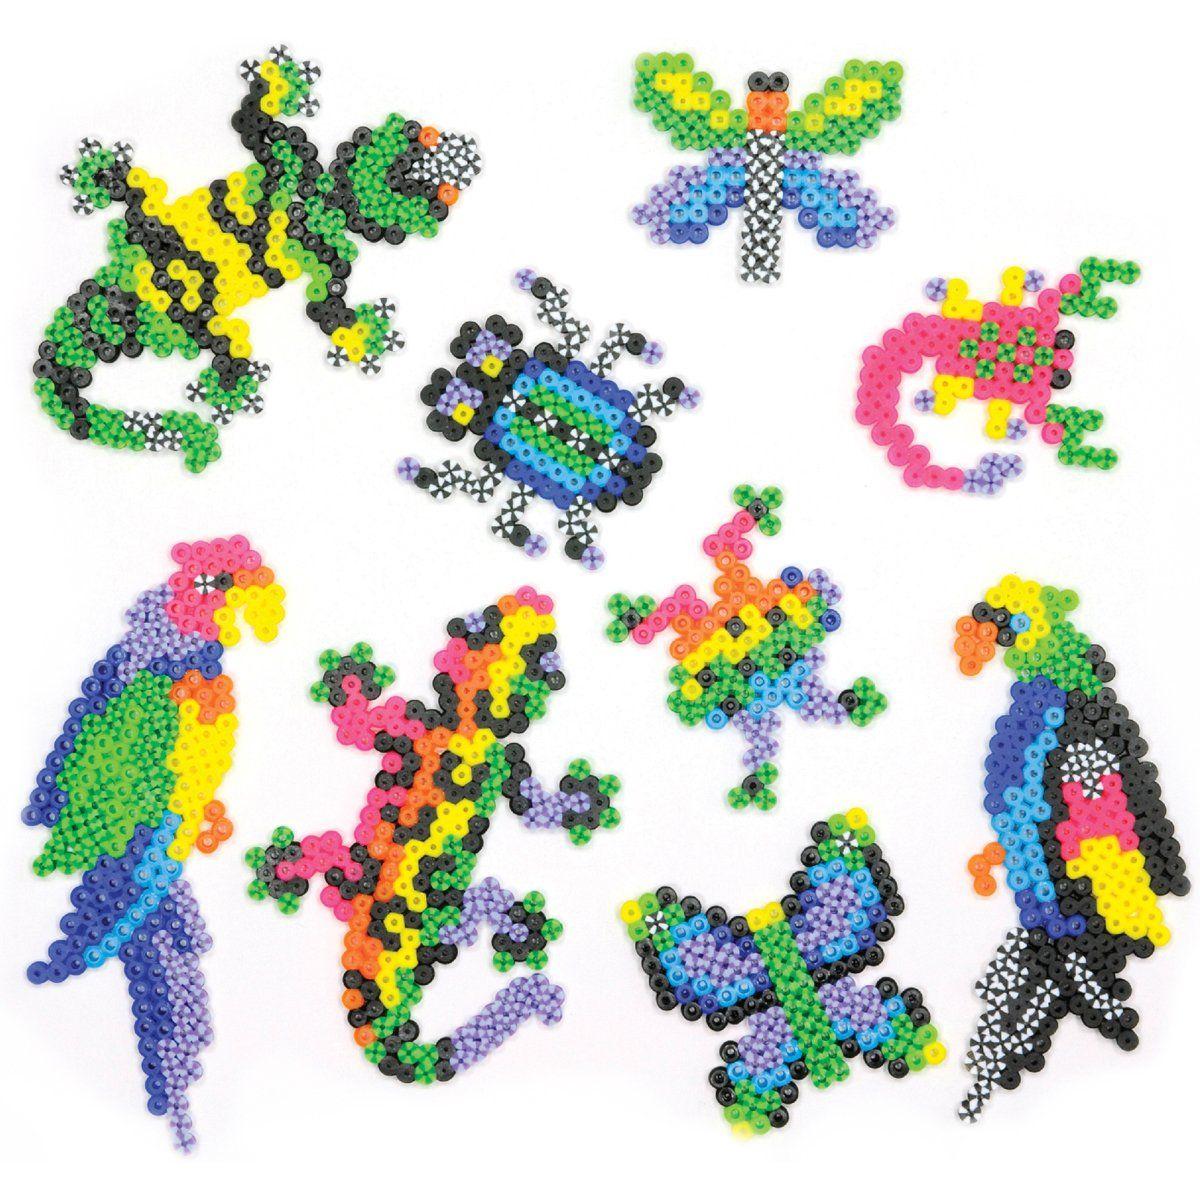 48+ Perler bead craft kit ideas in 2021